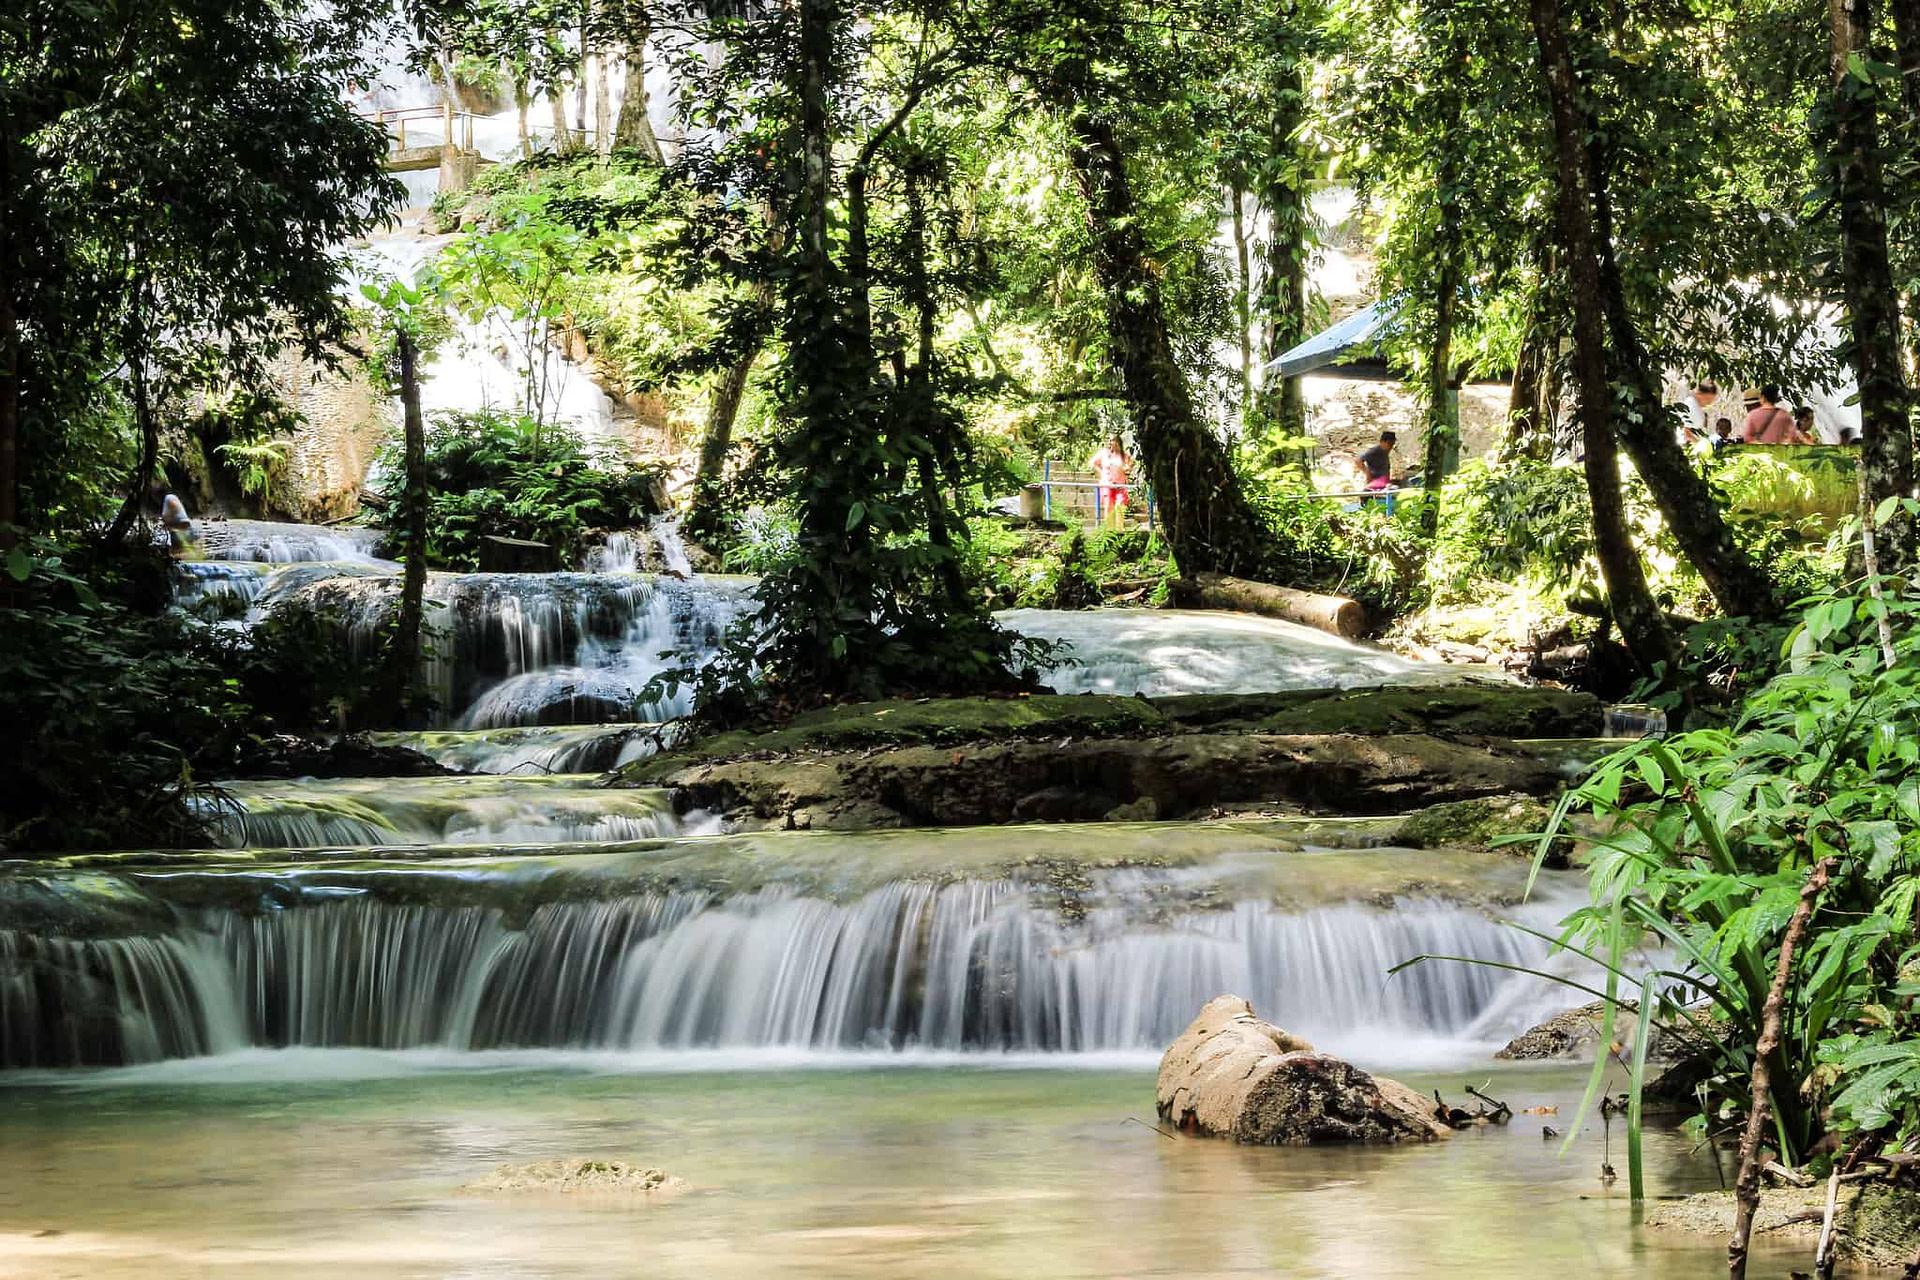 Saulopo waterfall - Ruth Onduko, Creative Commons BY-SA 2.0